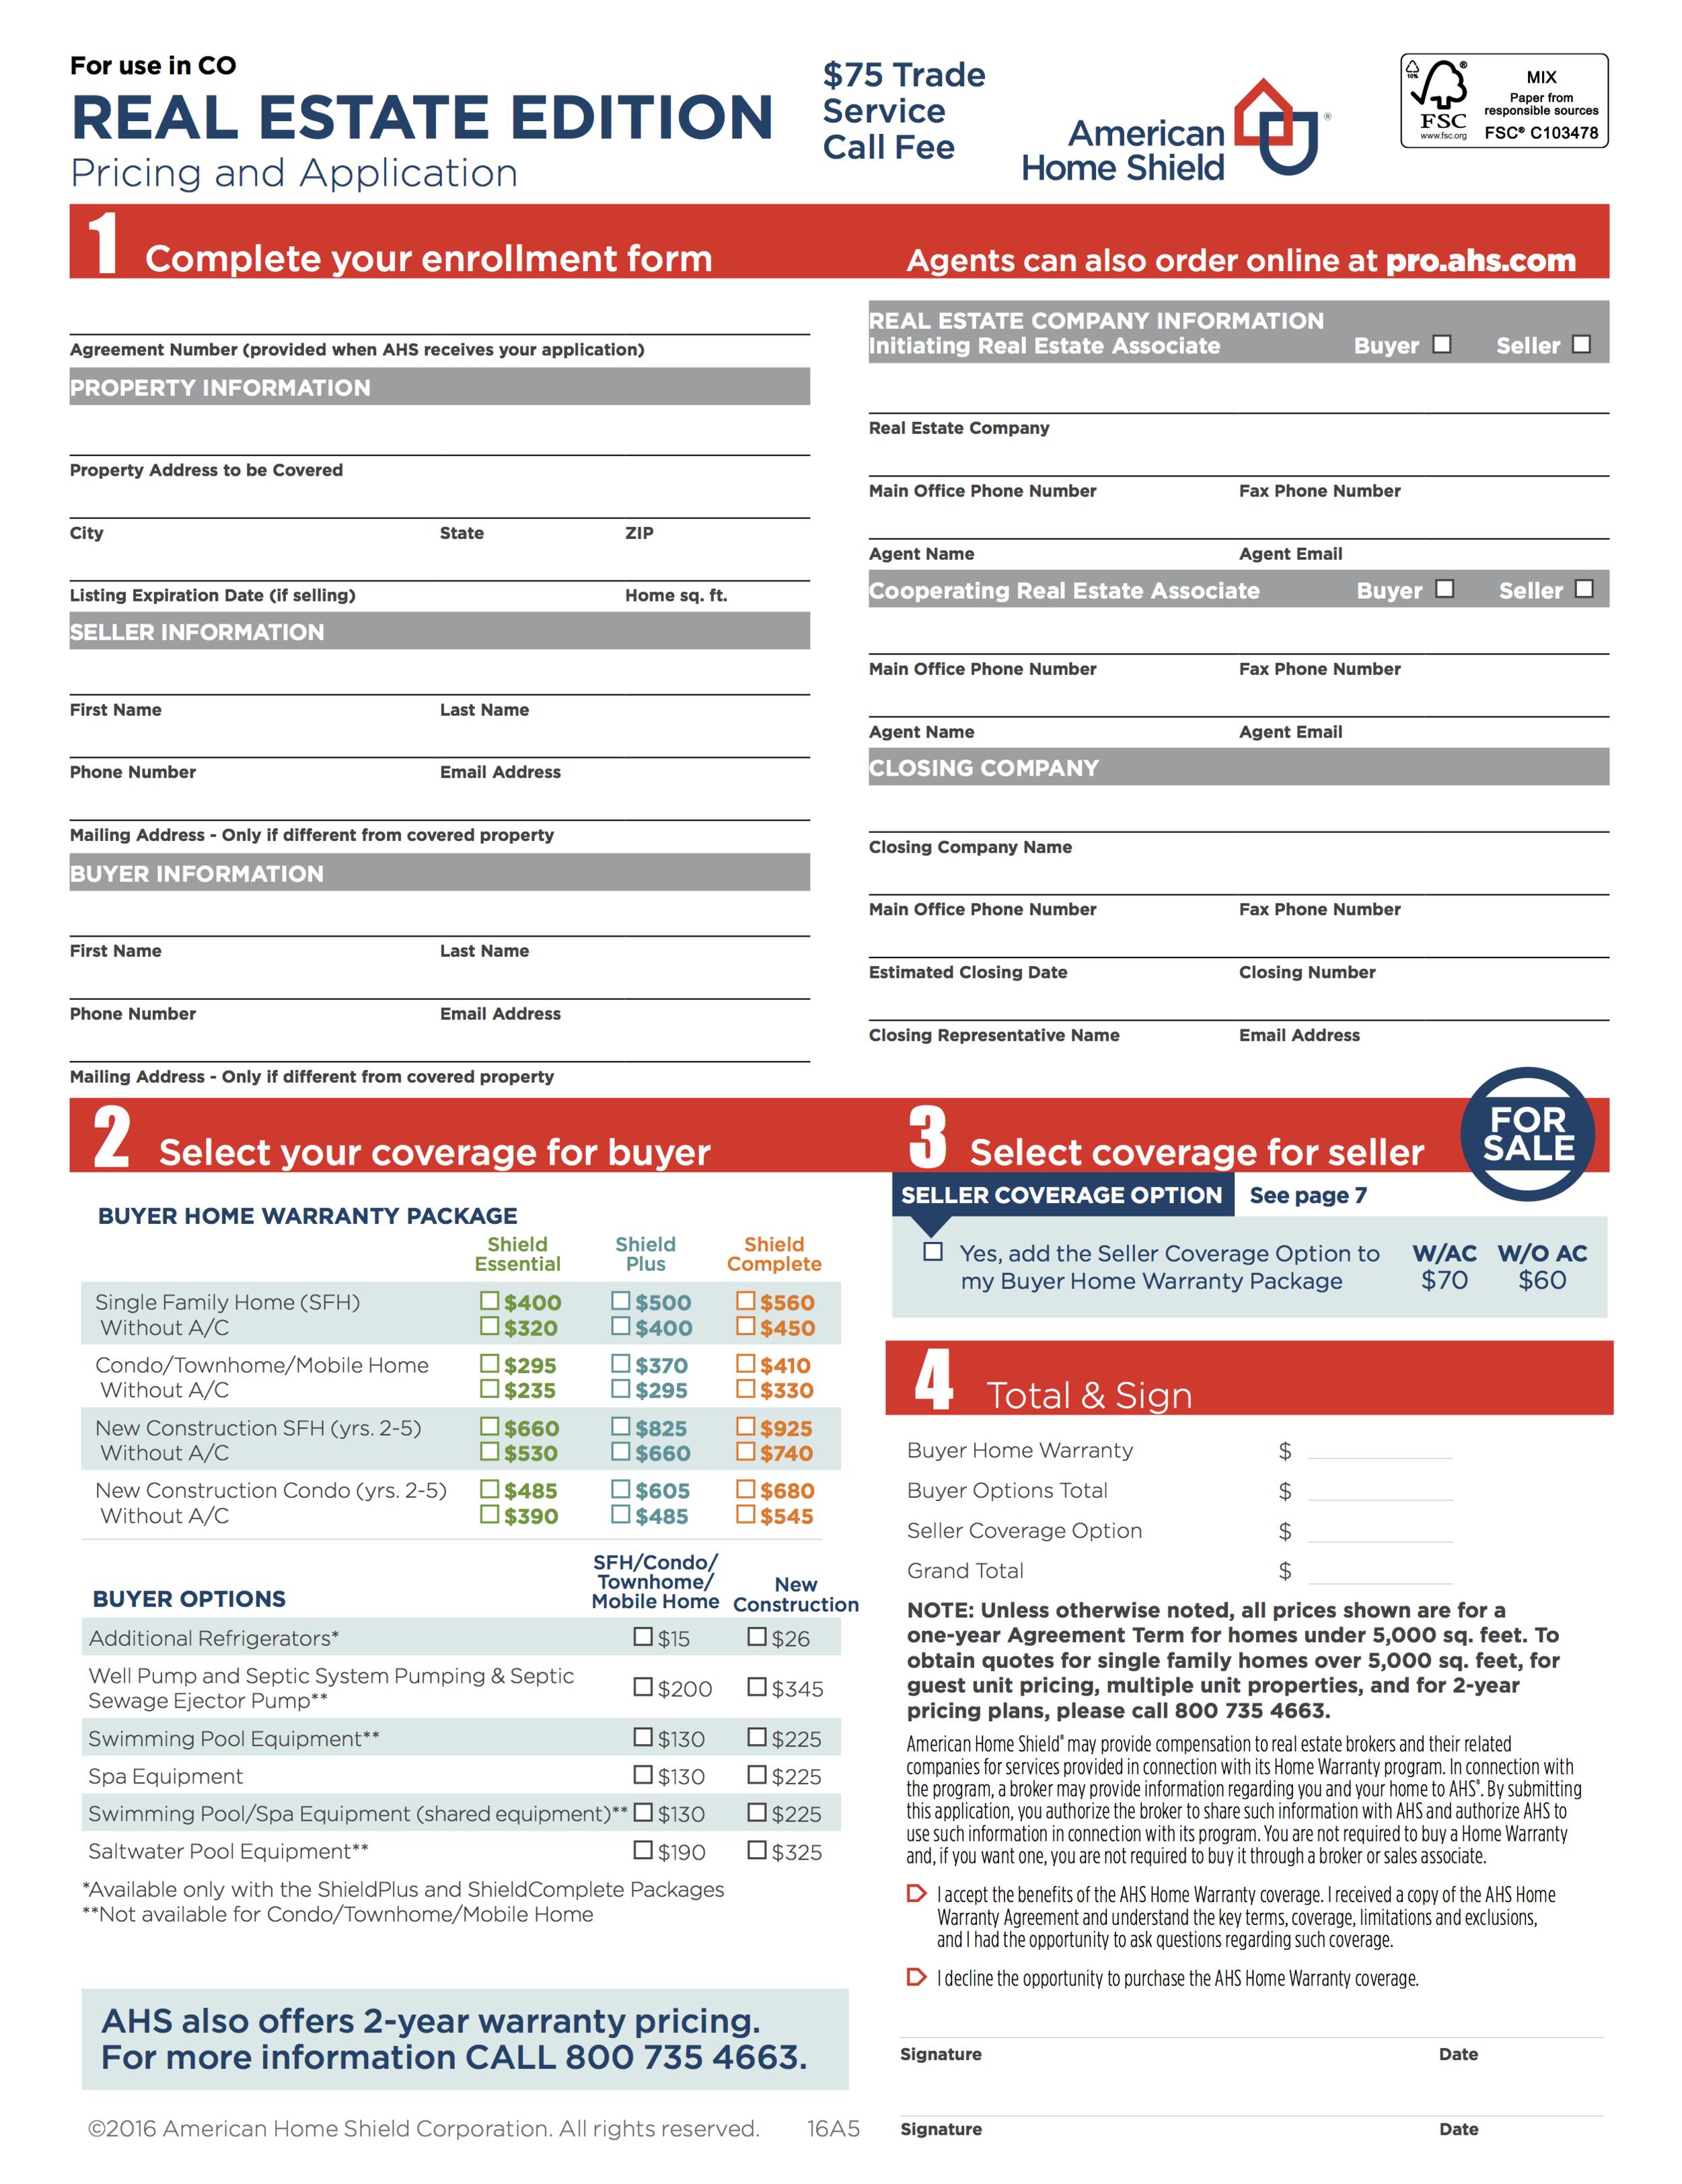 2017 AHS home warranty plans - real estate 8.png